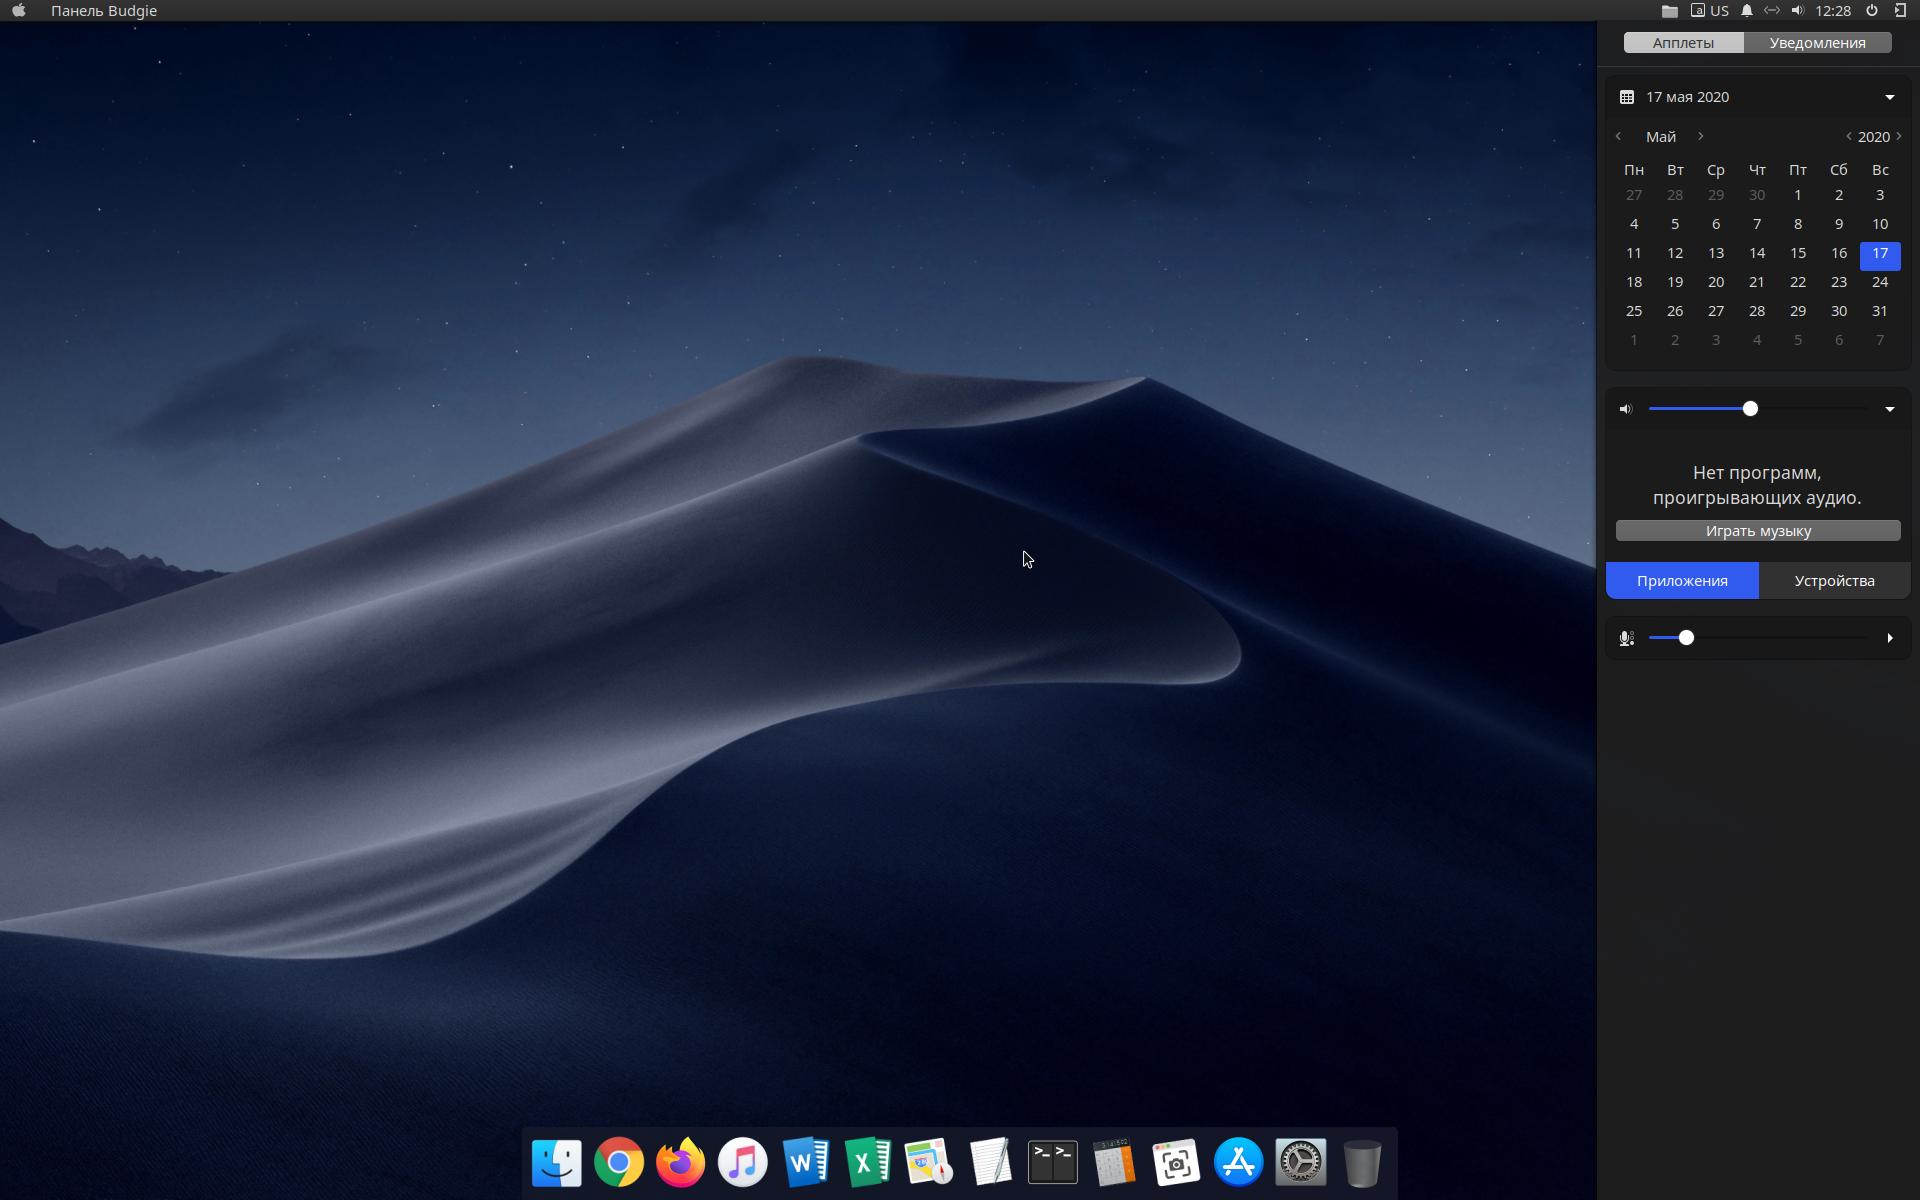 macbuntu budgie 20.04